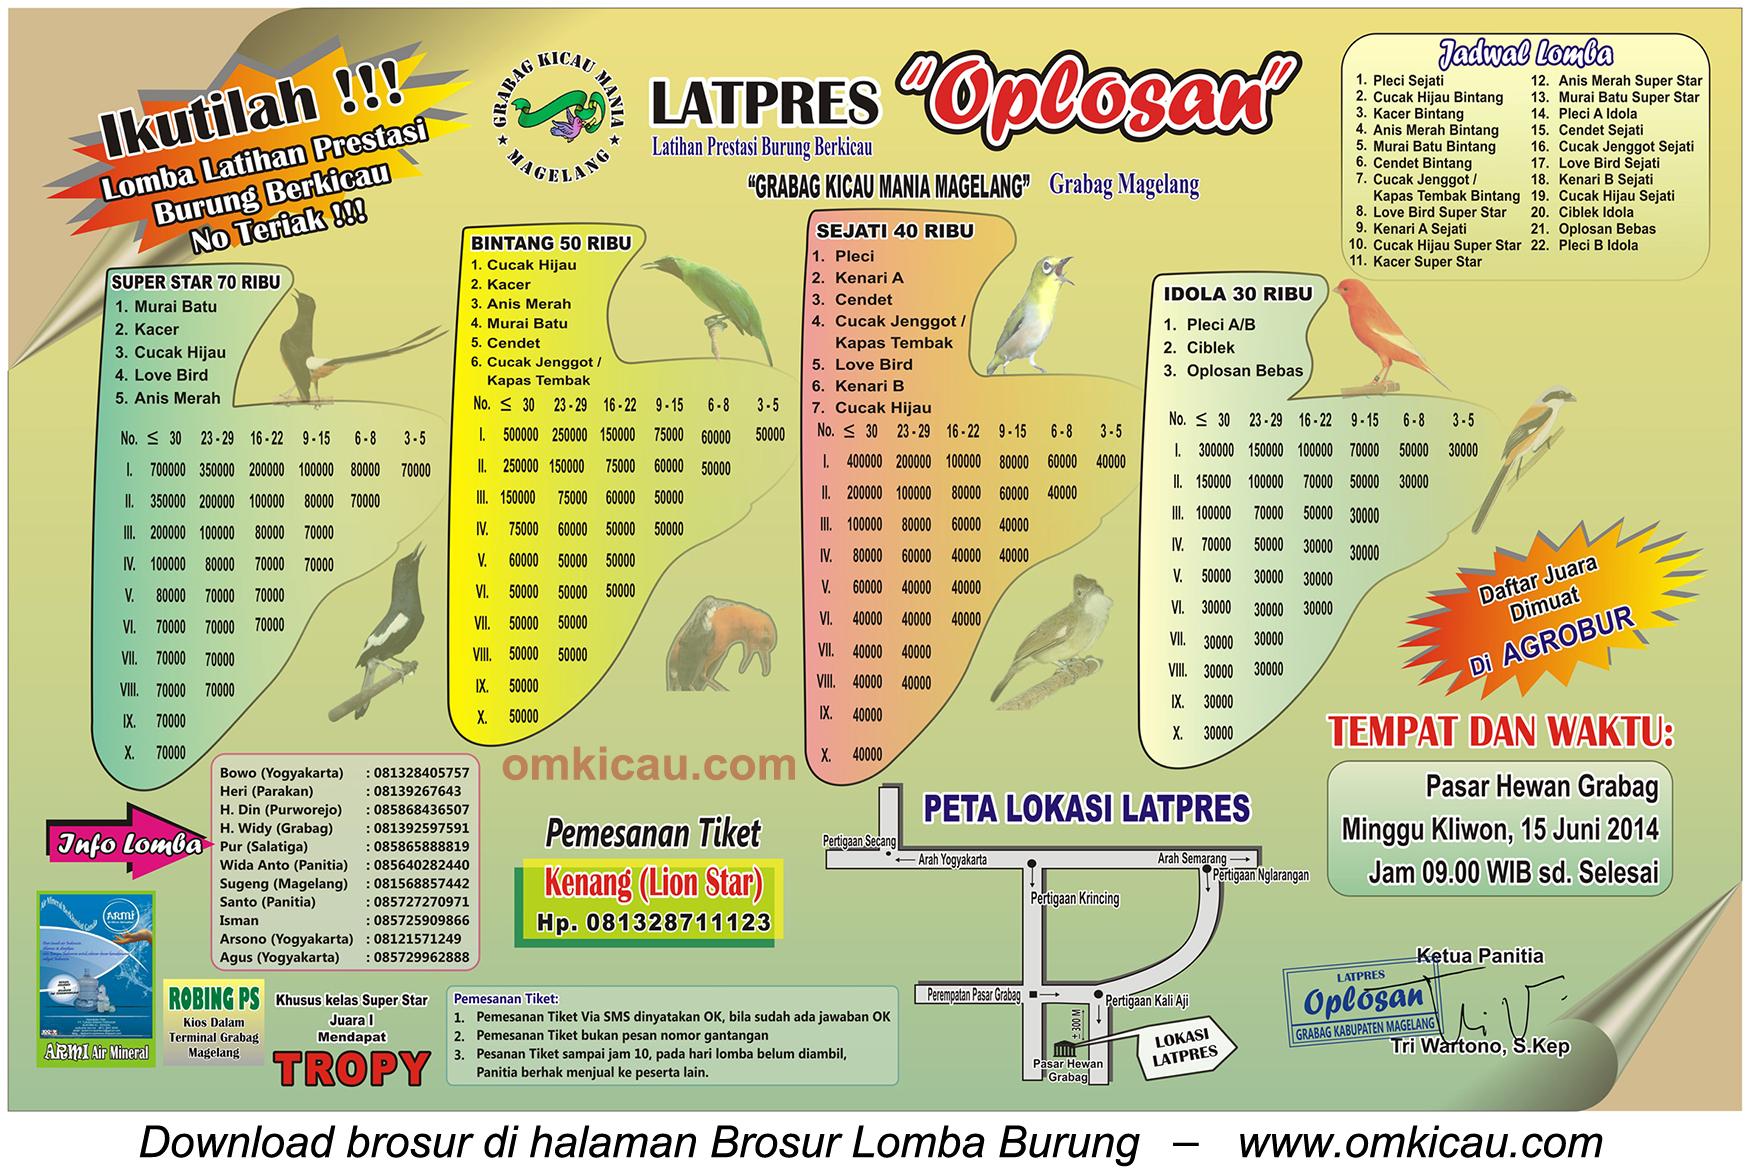 Brosur Latpres Burung Berkicau Oplosan, Magelang, 15 Juni 2014